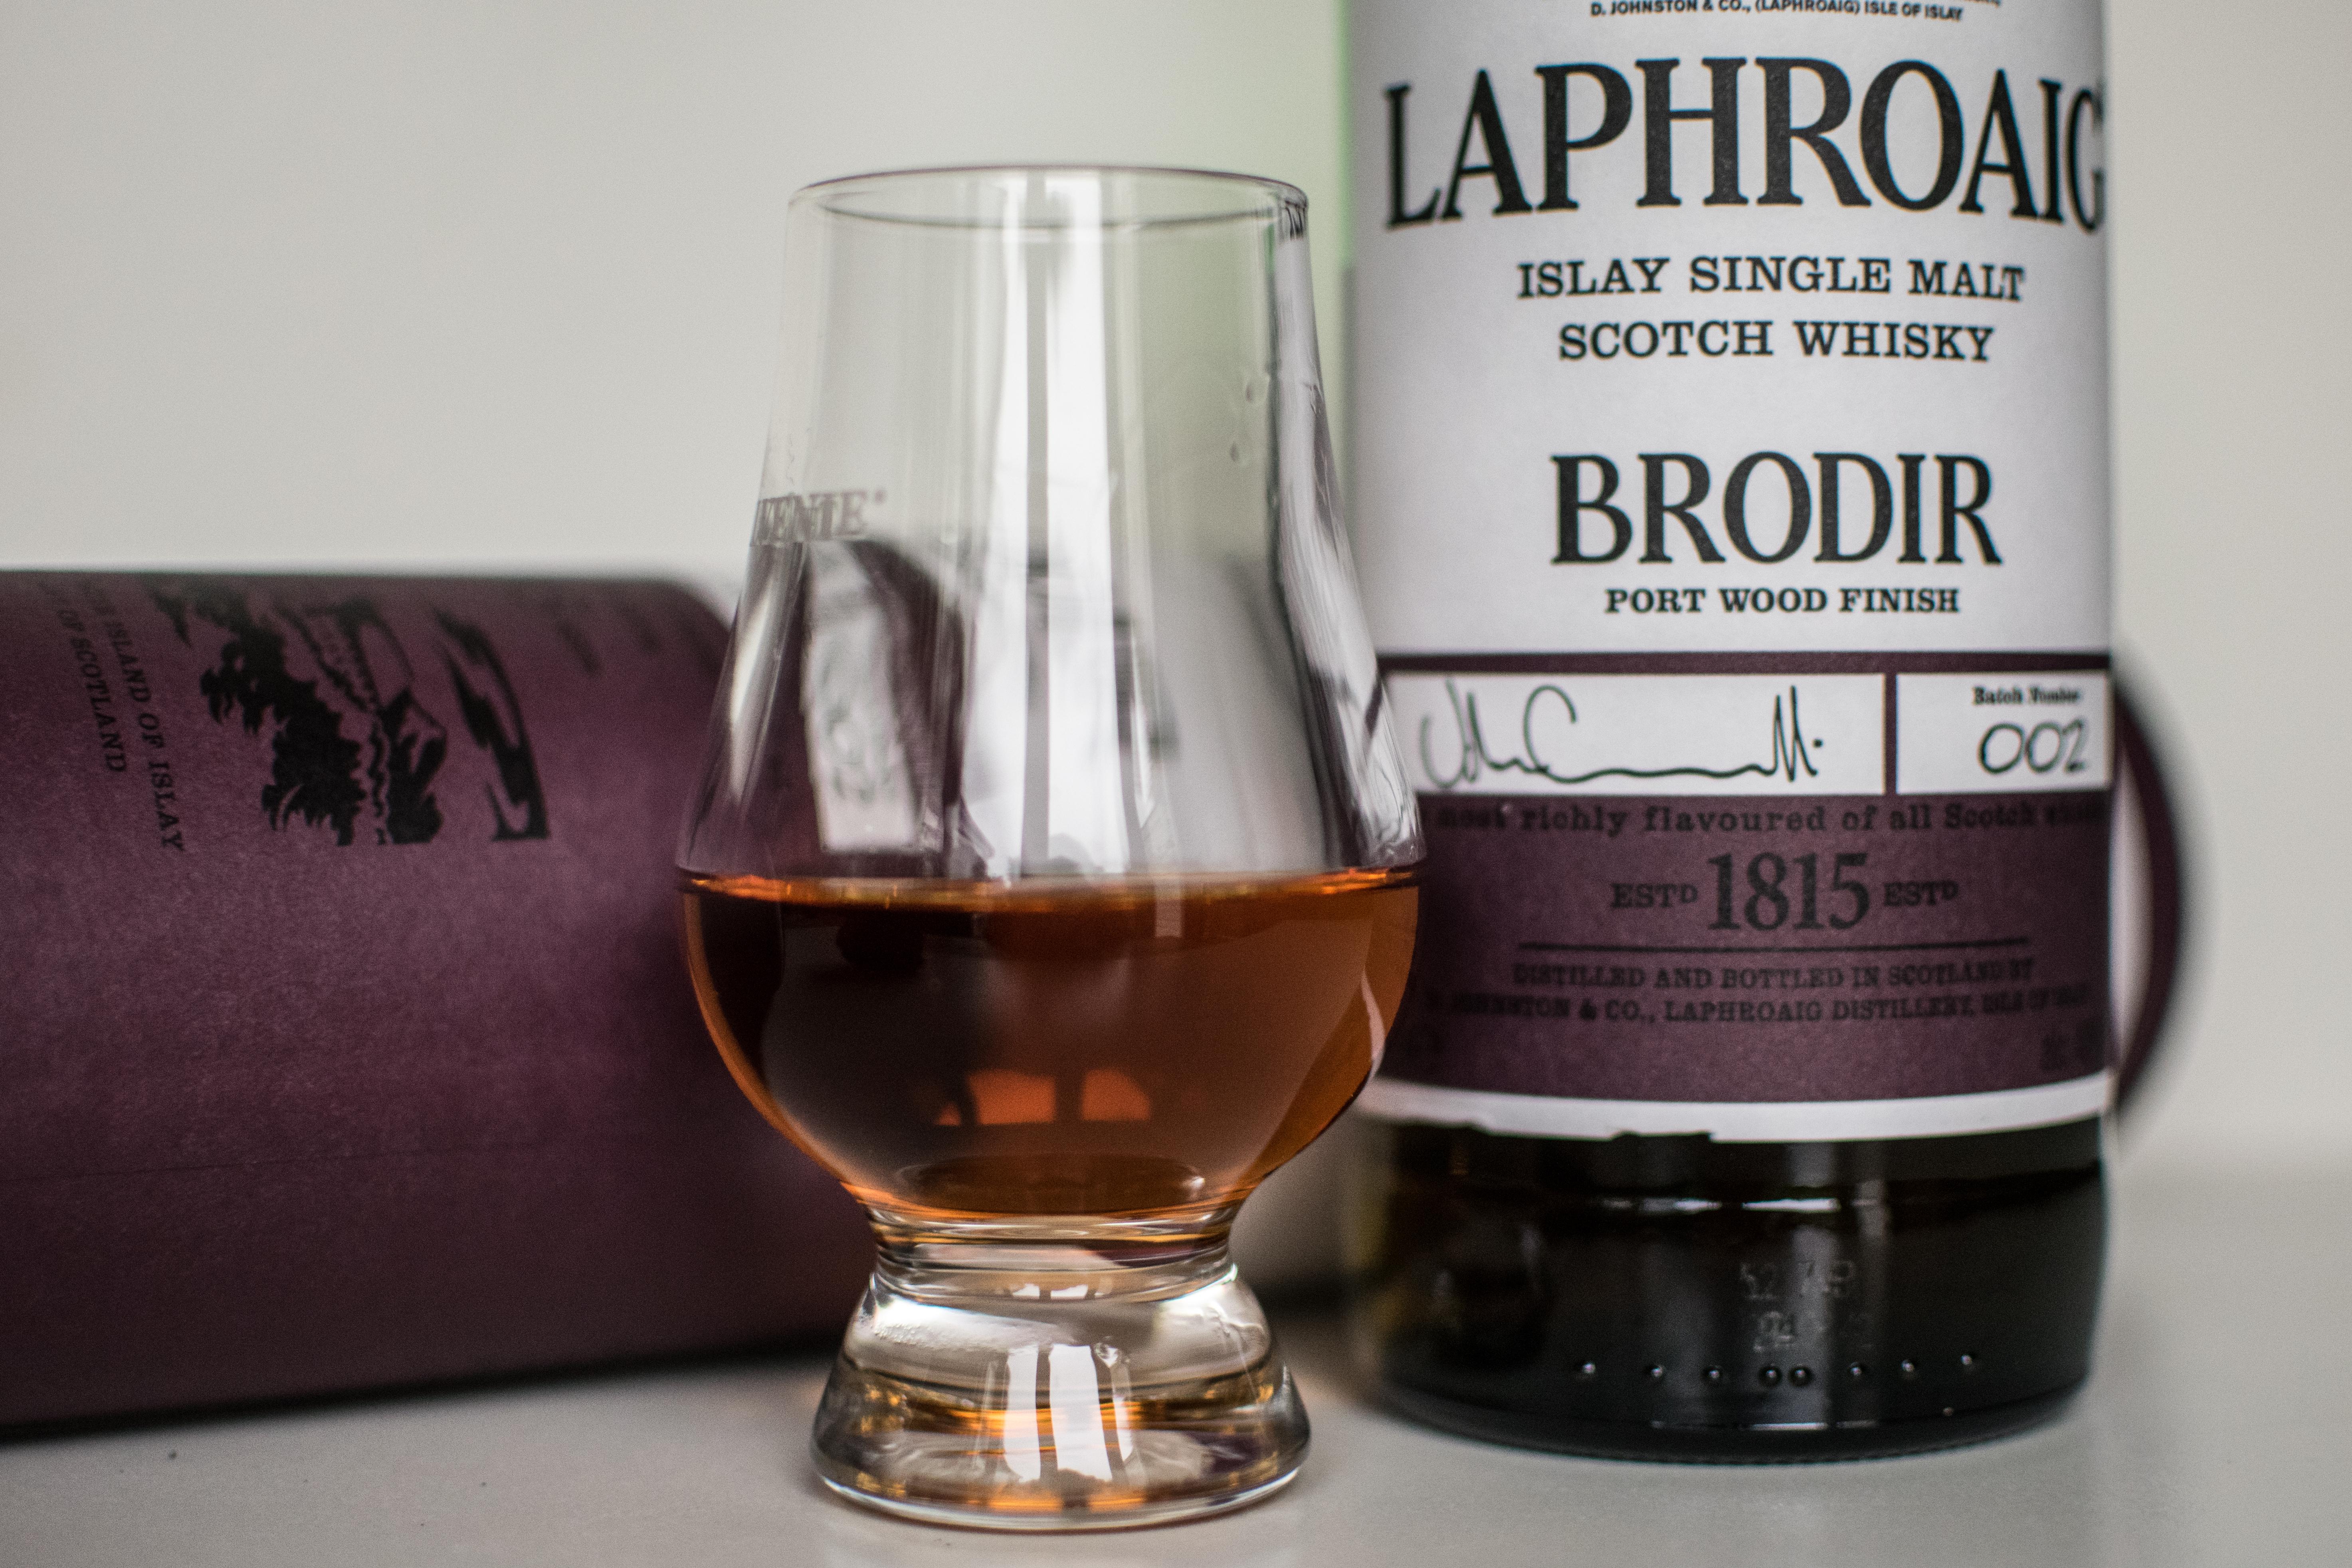 laphroaig-brodir-01